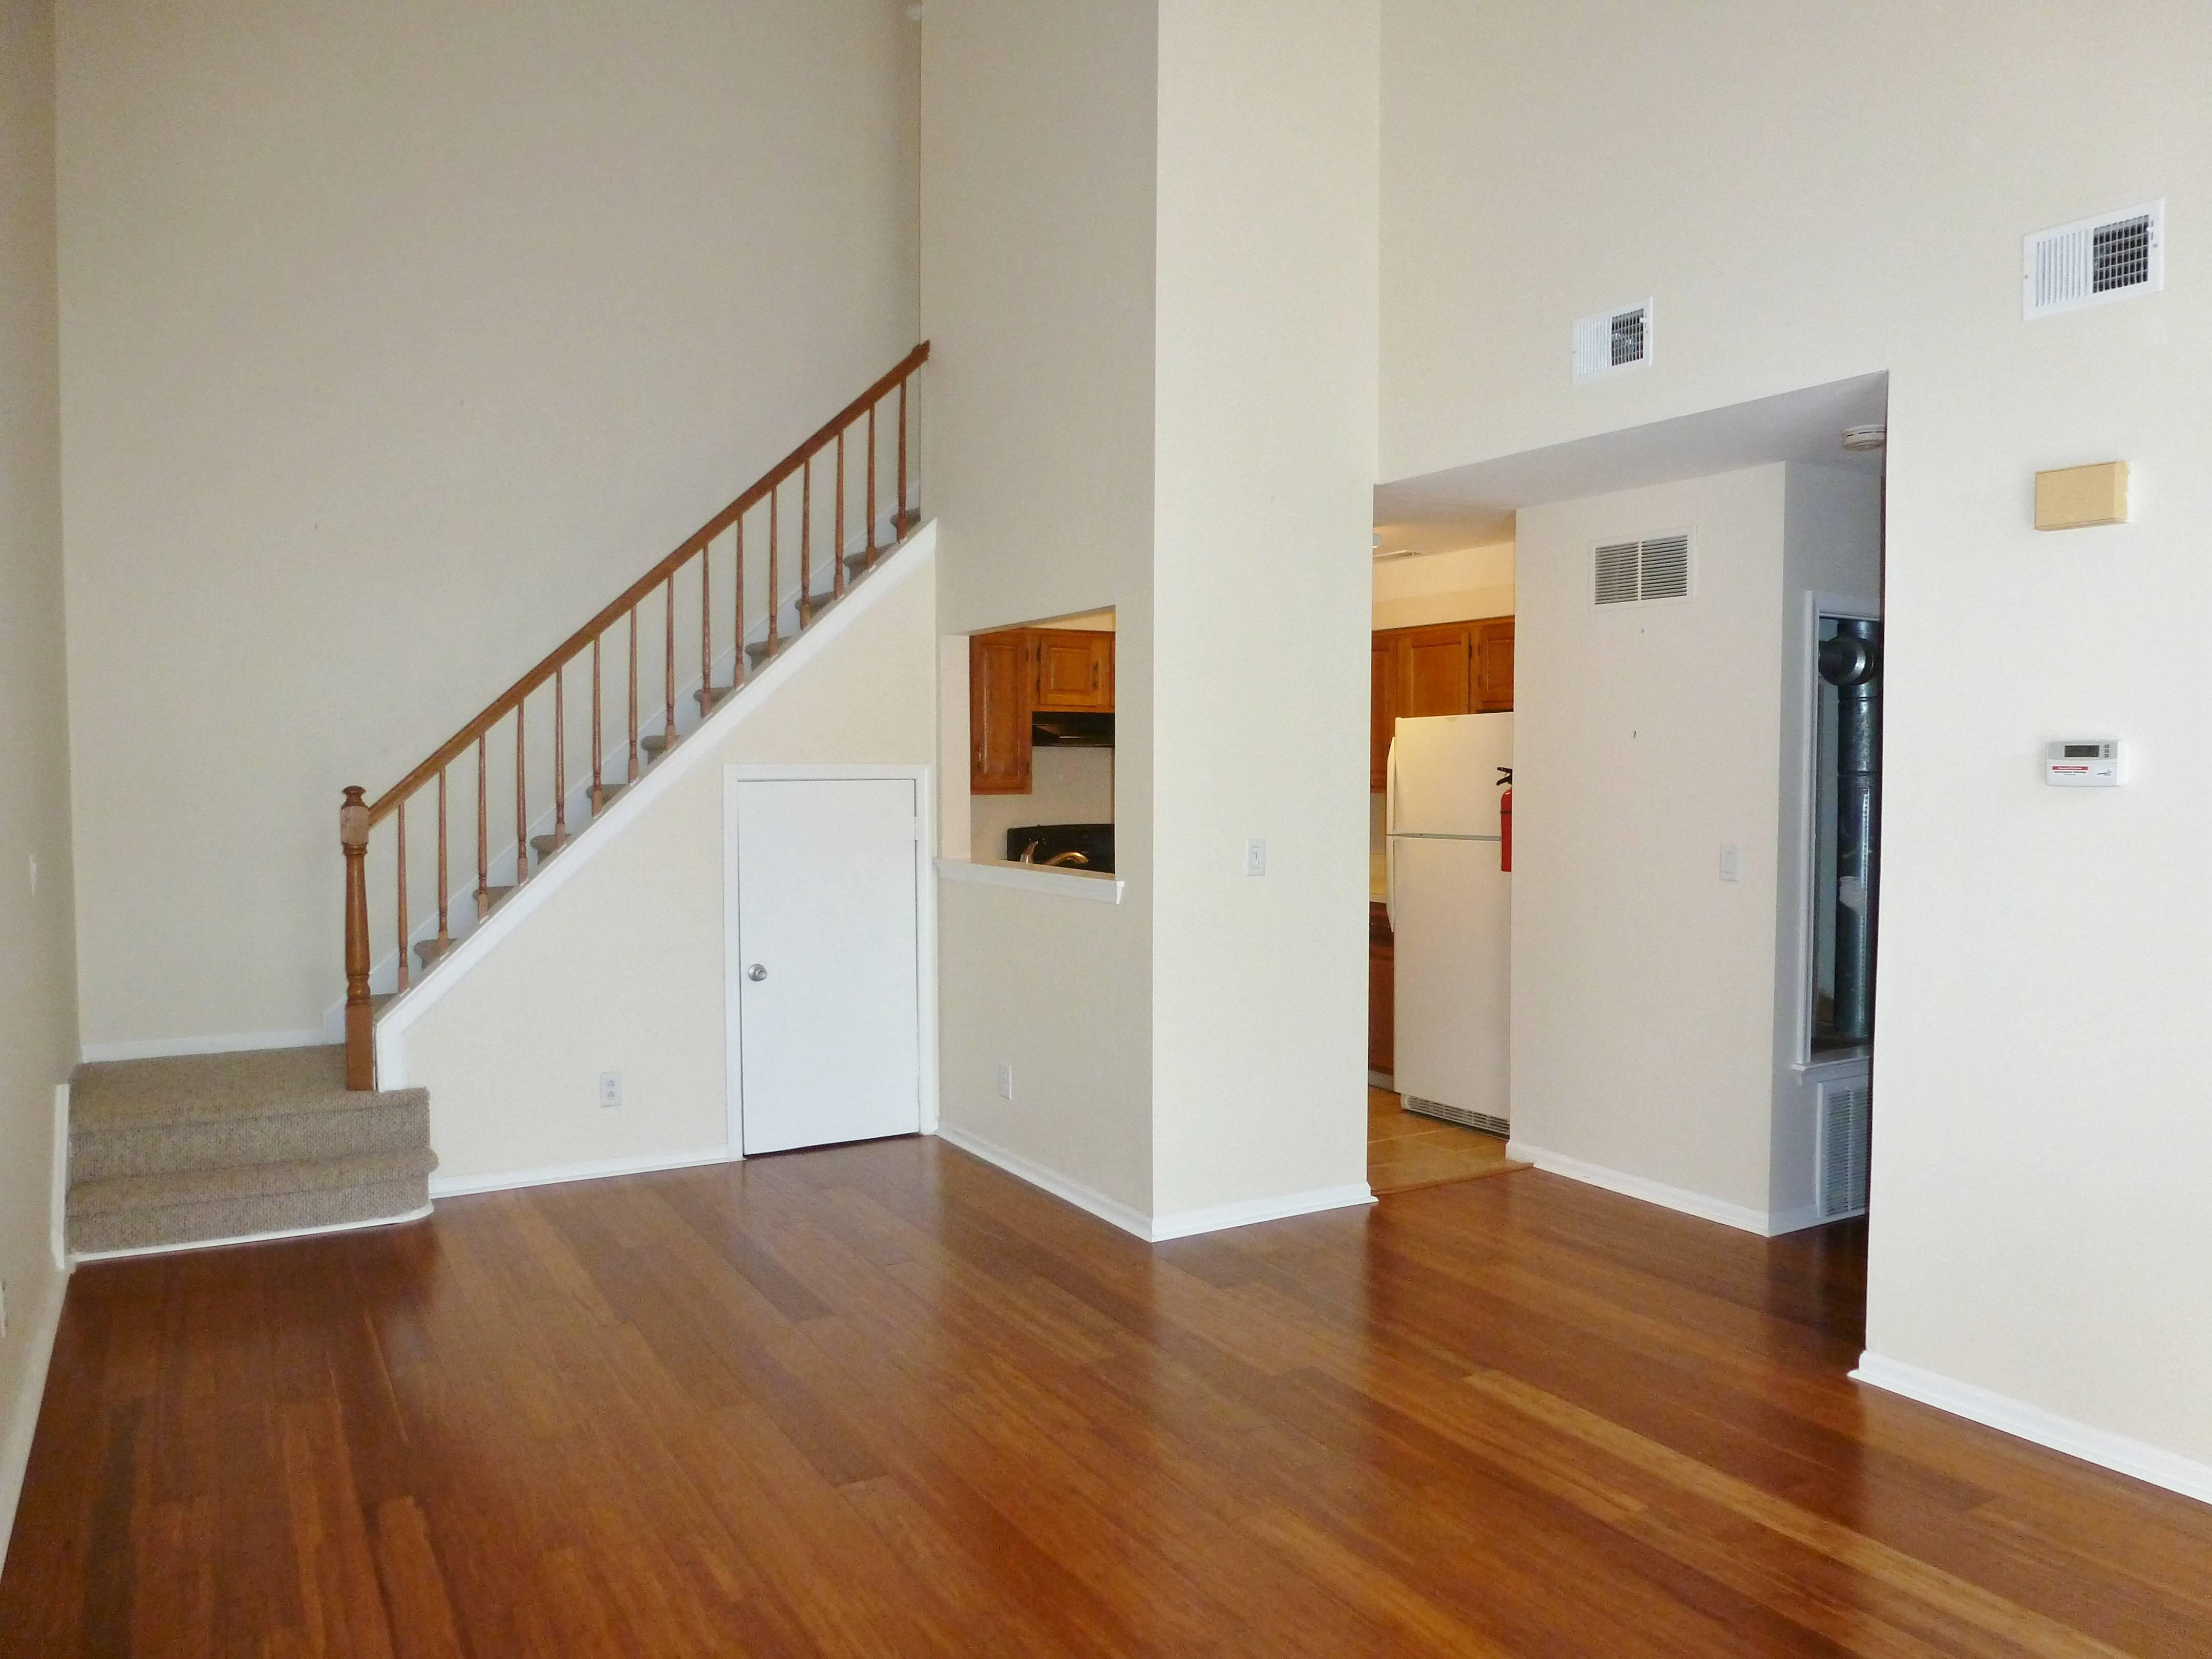 2 bedroom 2 bath condo for rent  1780  bedminster